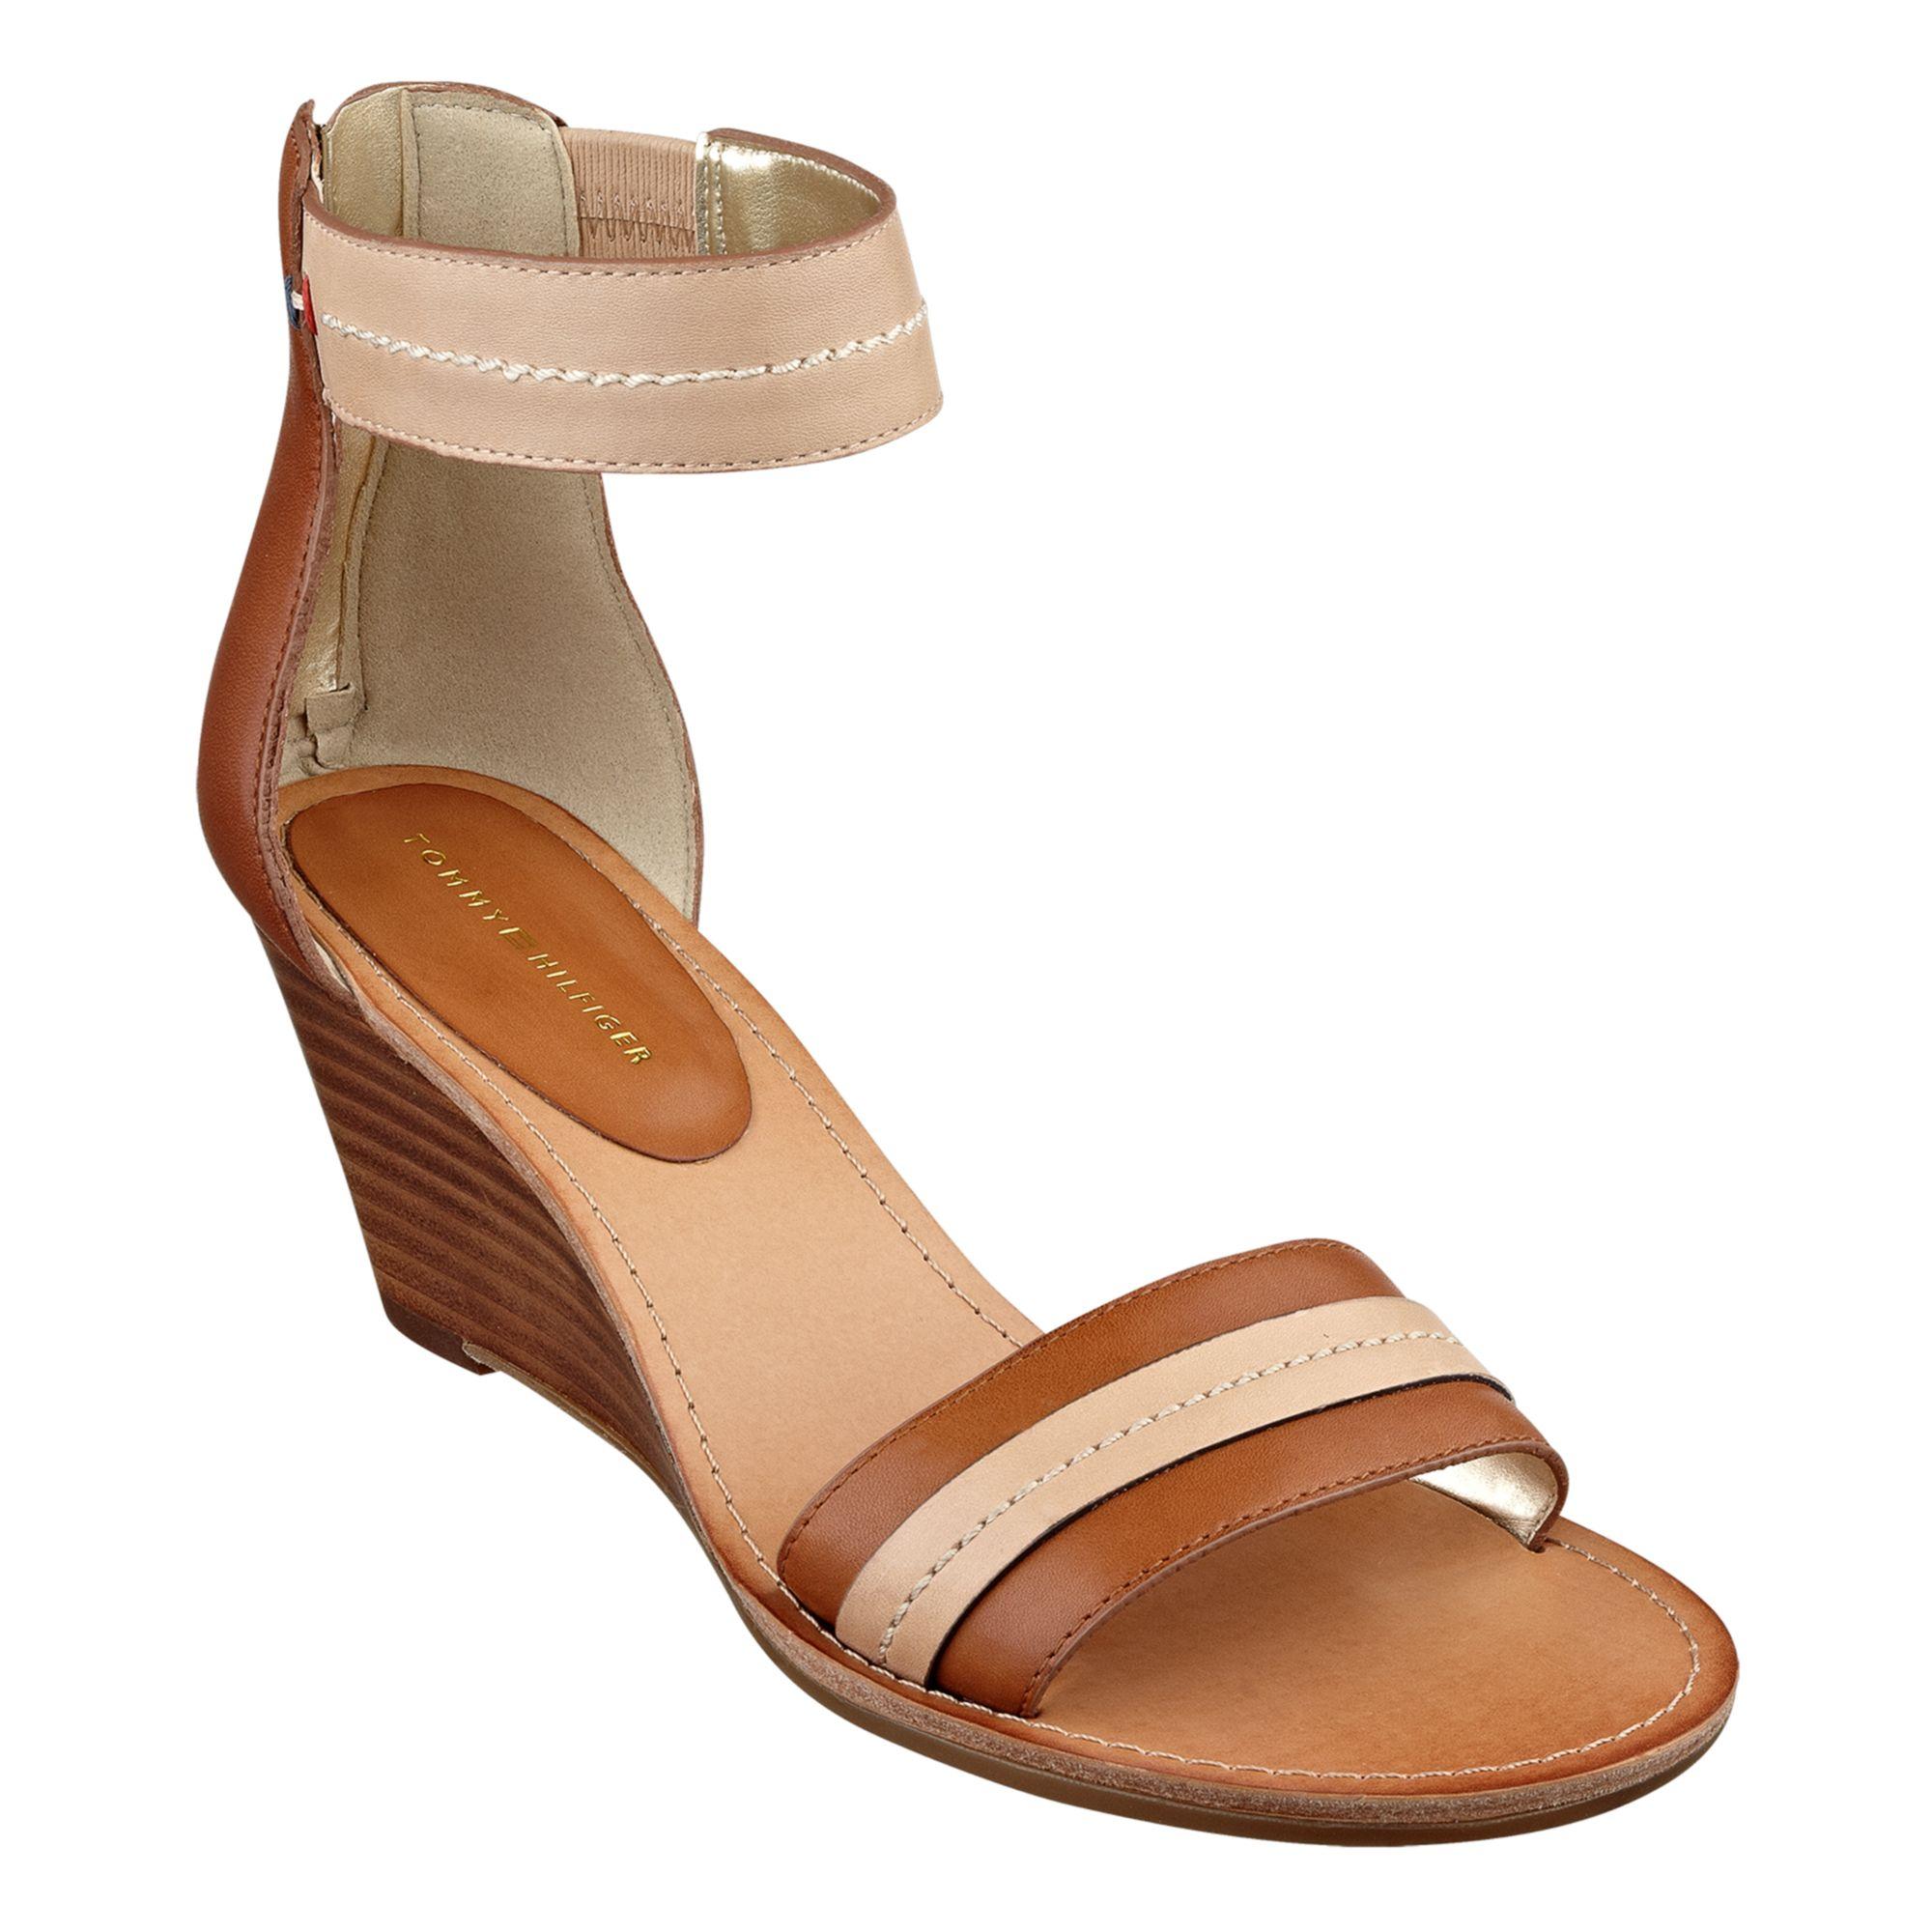 tommy hilfiger yara akle strap wedge sandals in brown luggage lyst. Black Bedroom Furniture Sets. Home Design Ideas